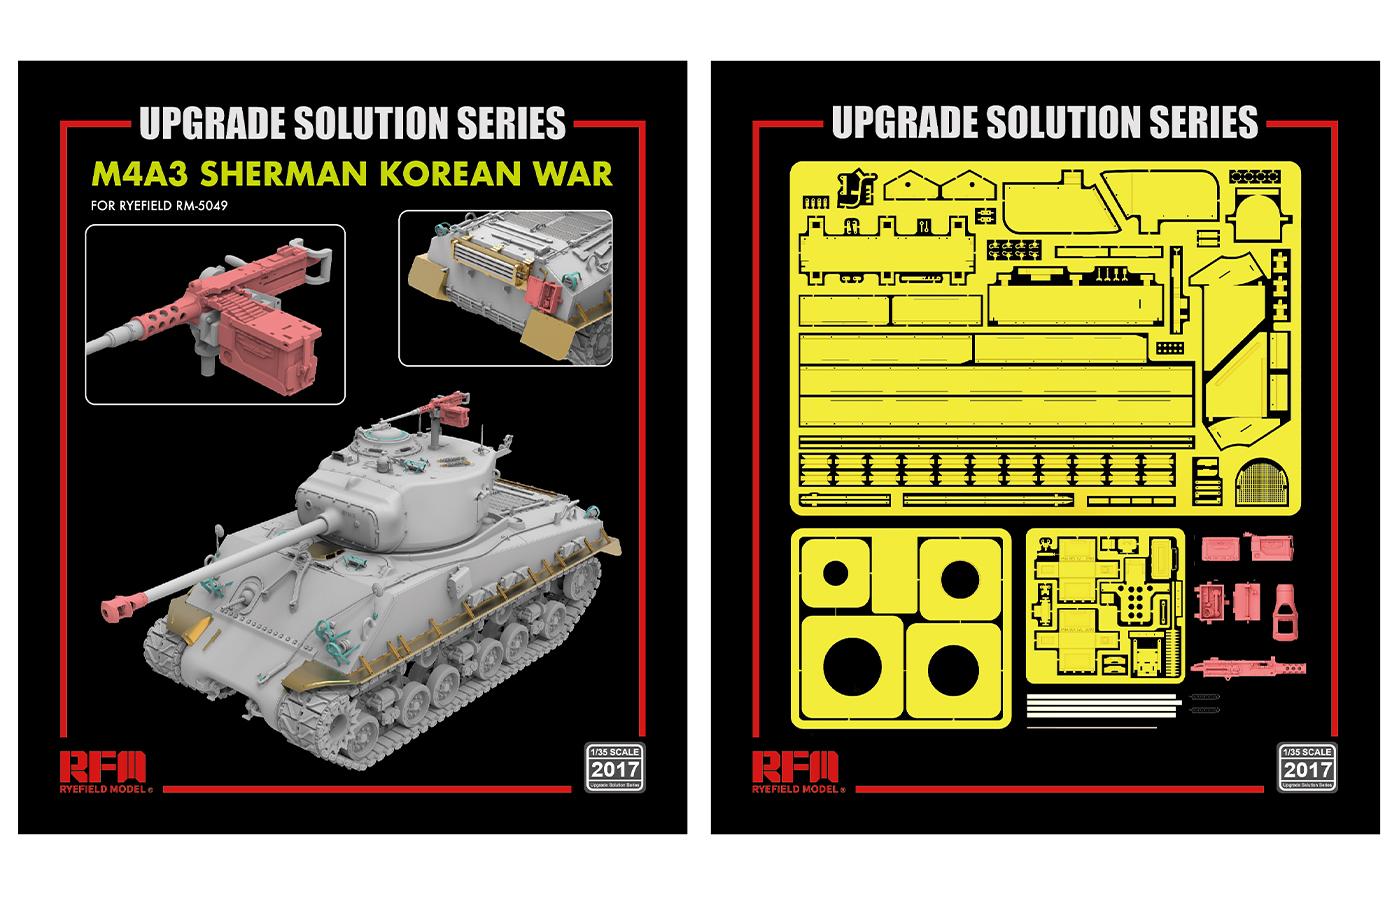 RM-2017 M4A3 SHERMAN KOREAN WAR